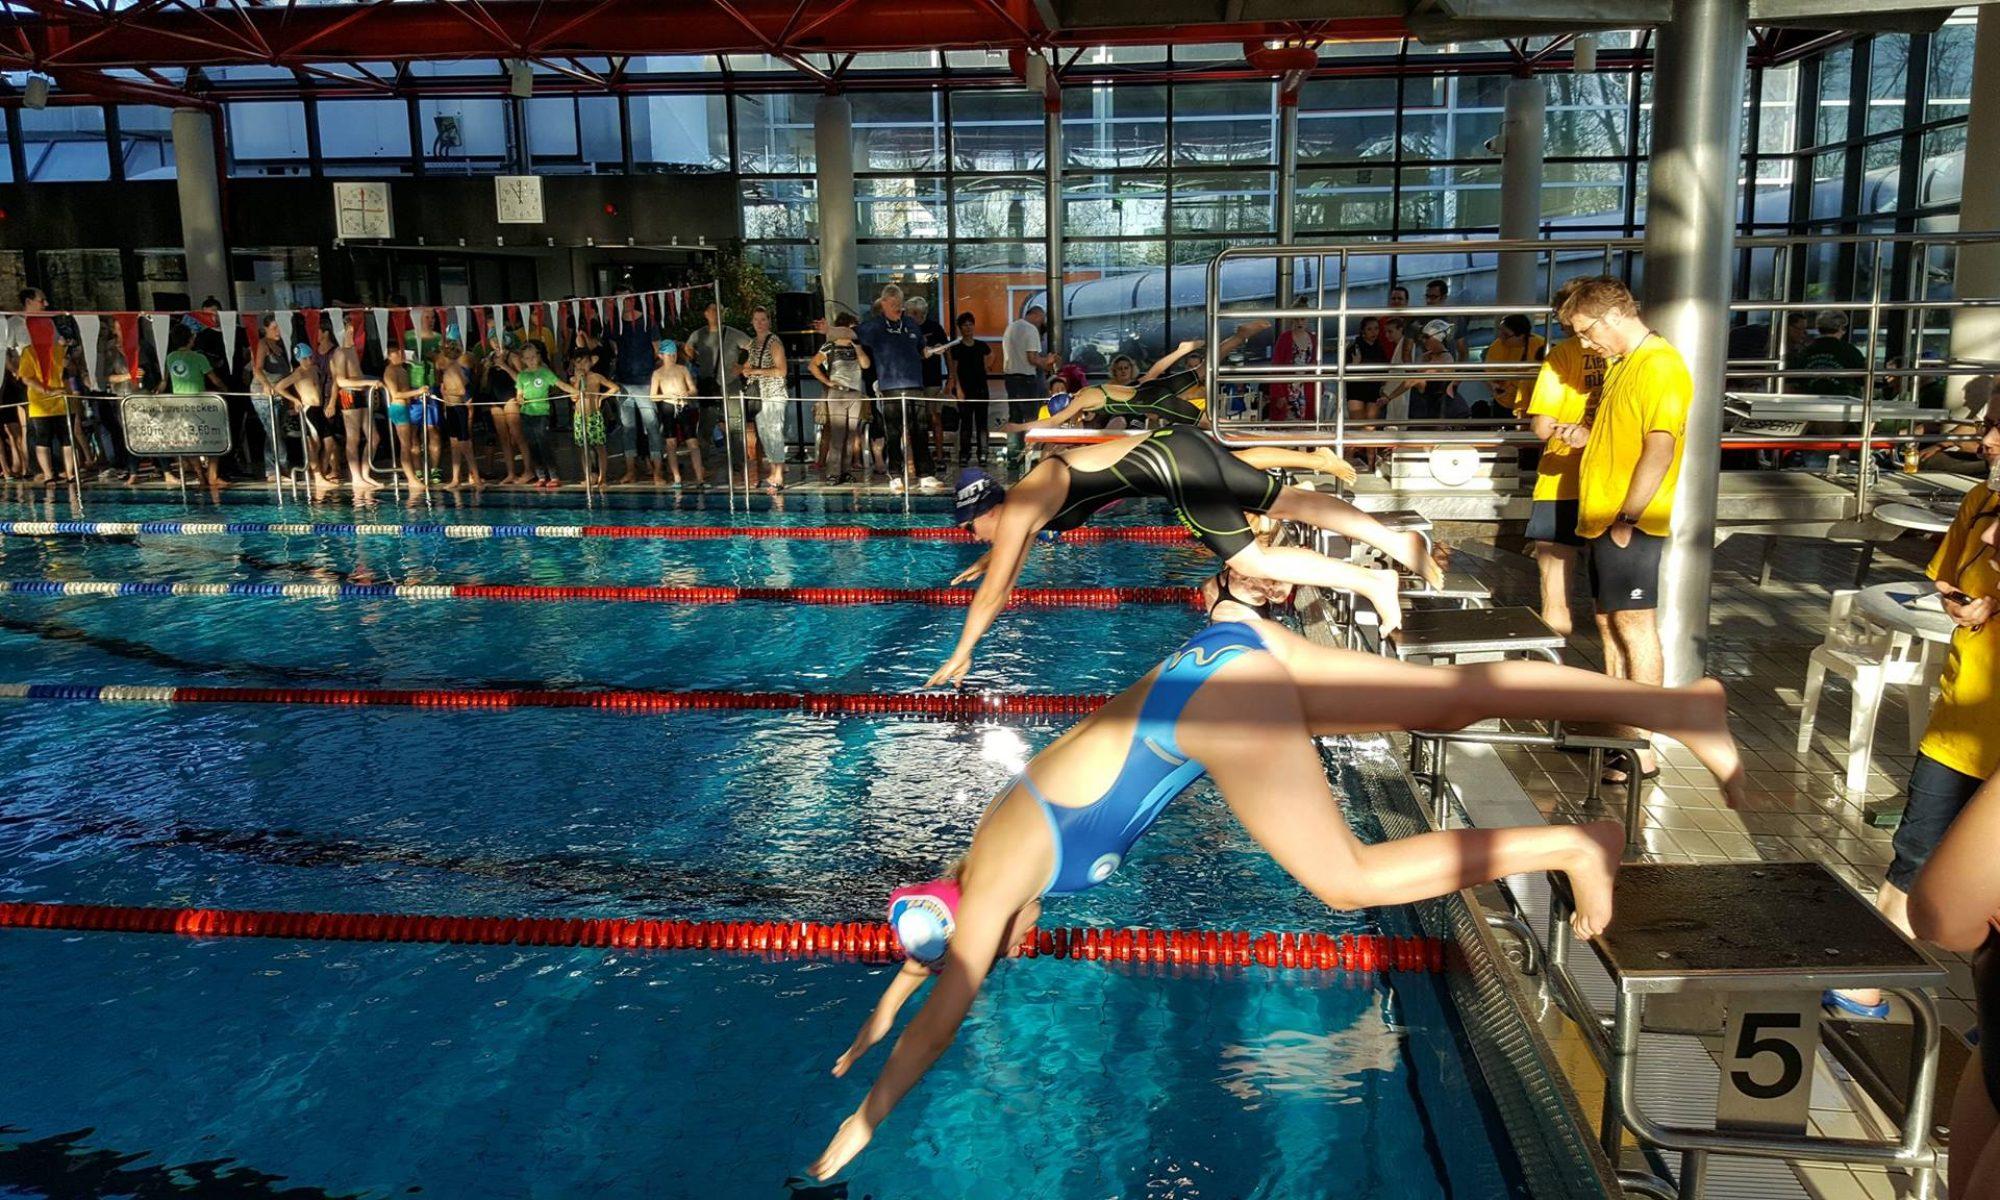 Frechener Schwimm-Verein e.V.